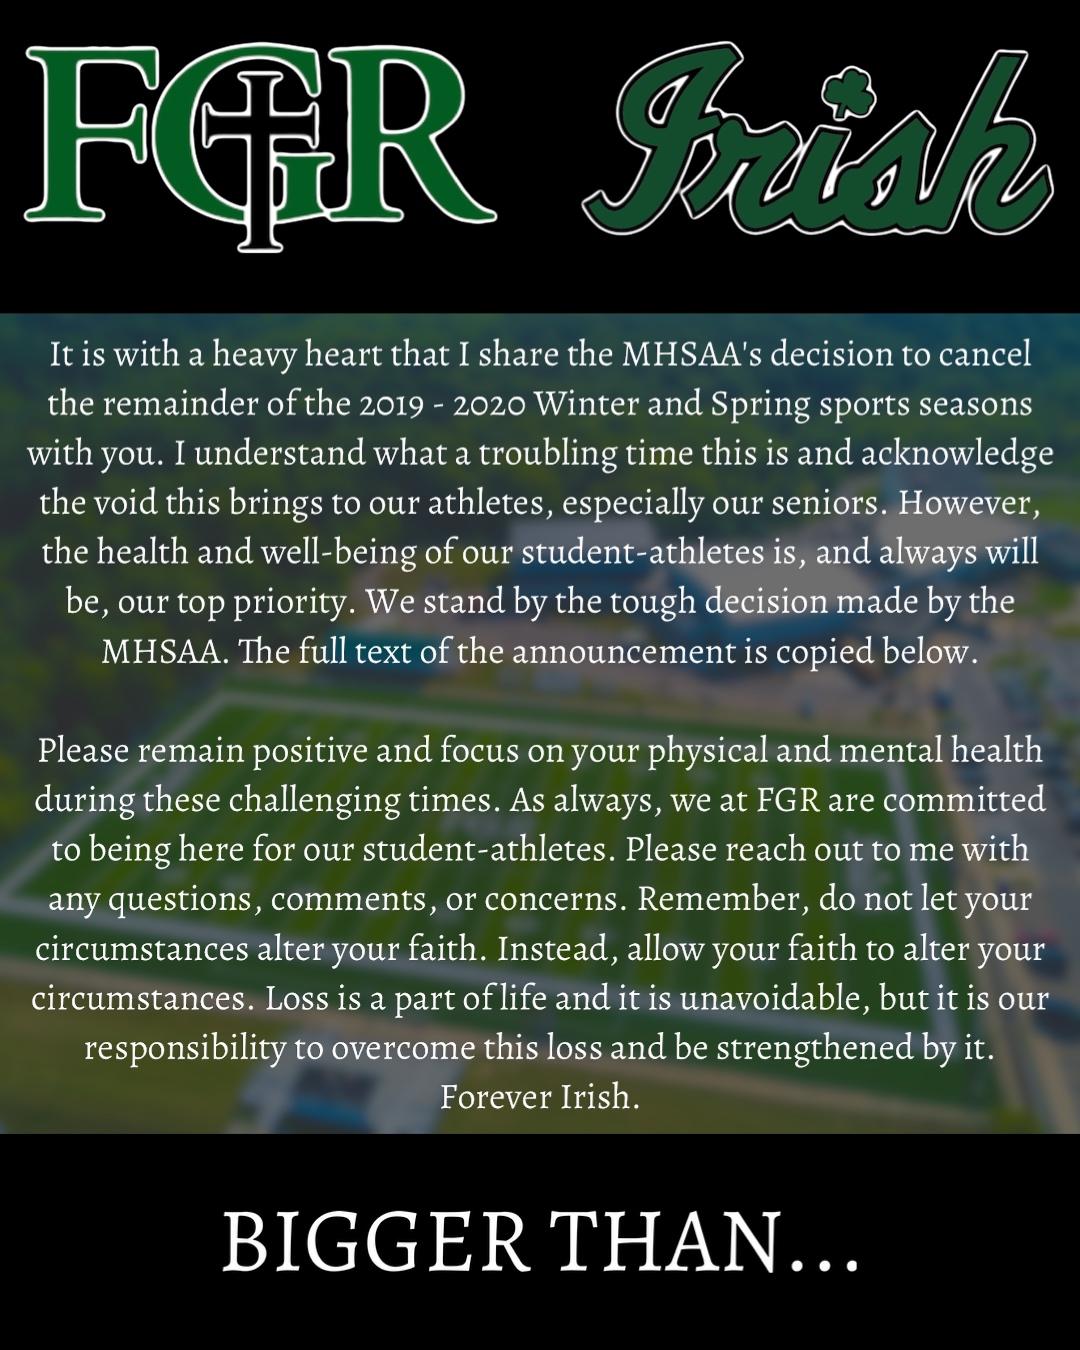 MHSAA Update on Spring Sports